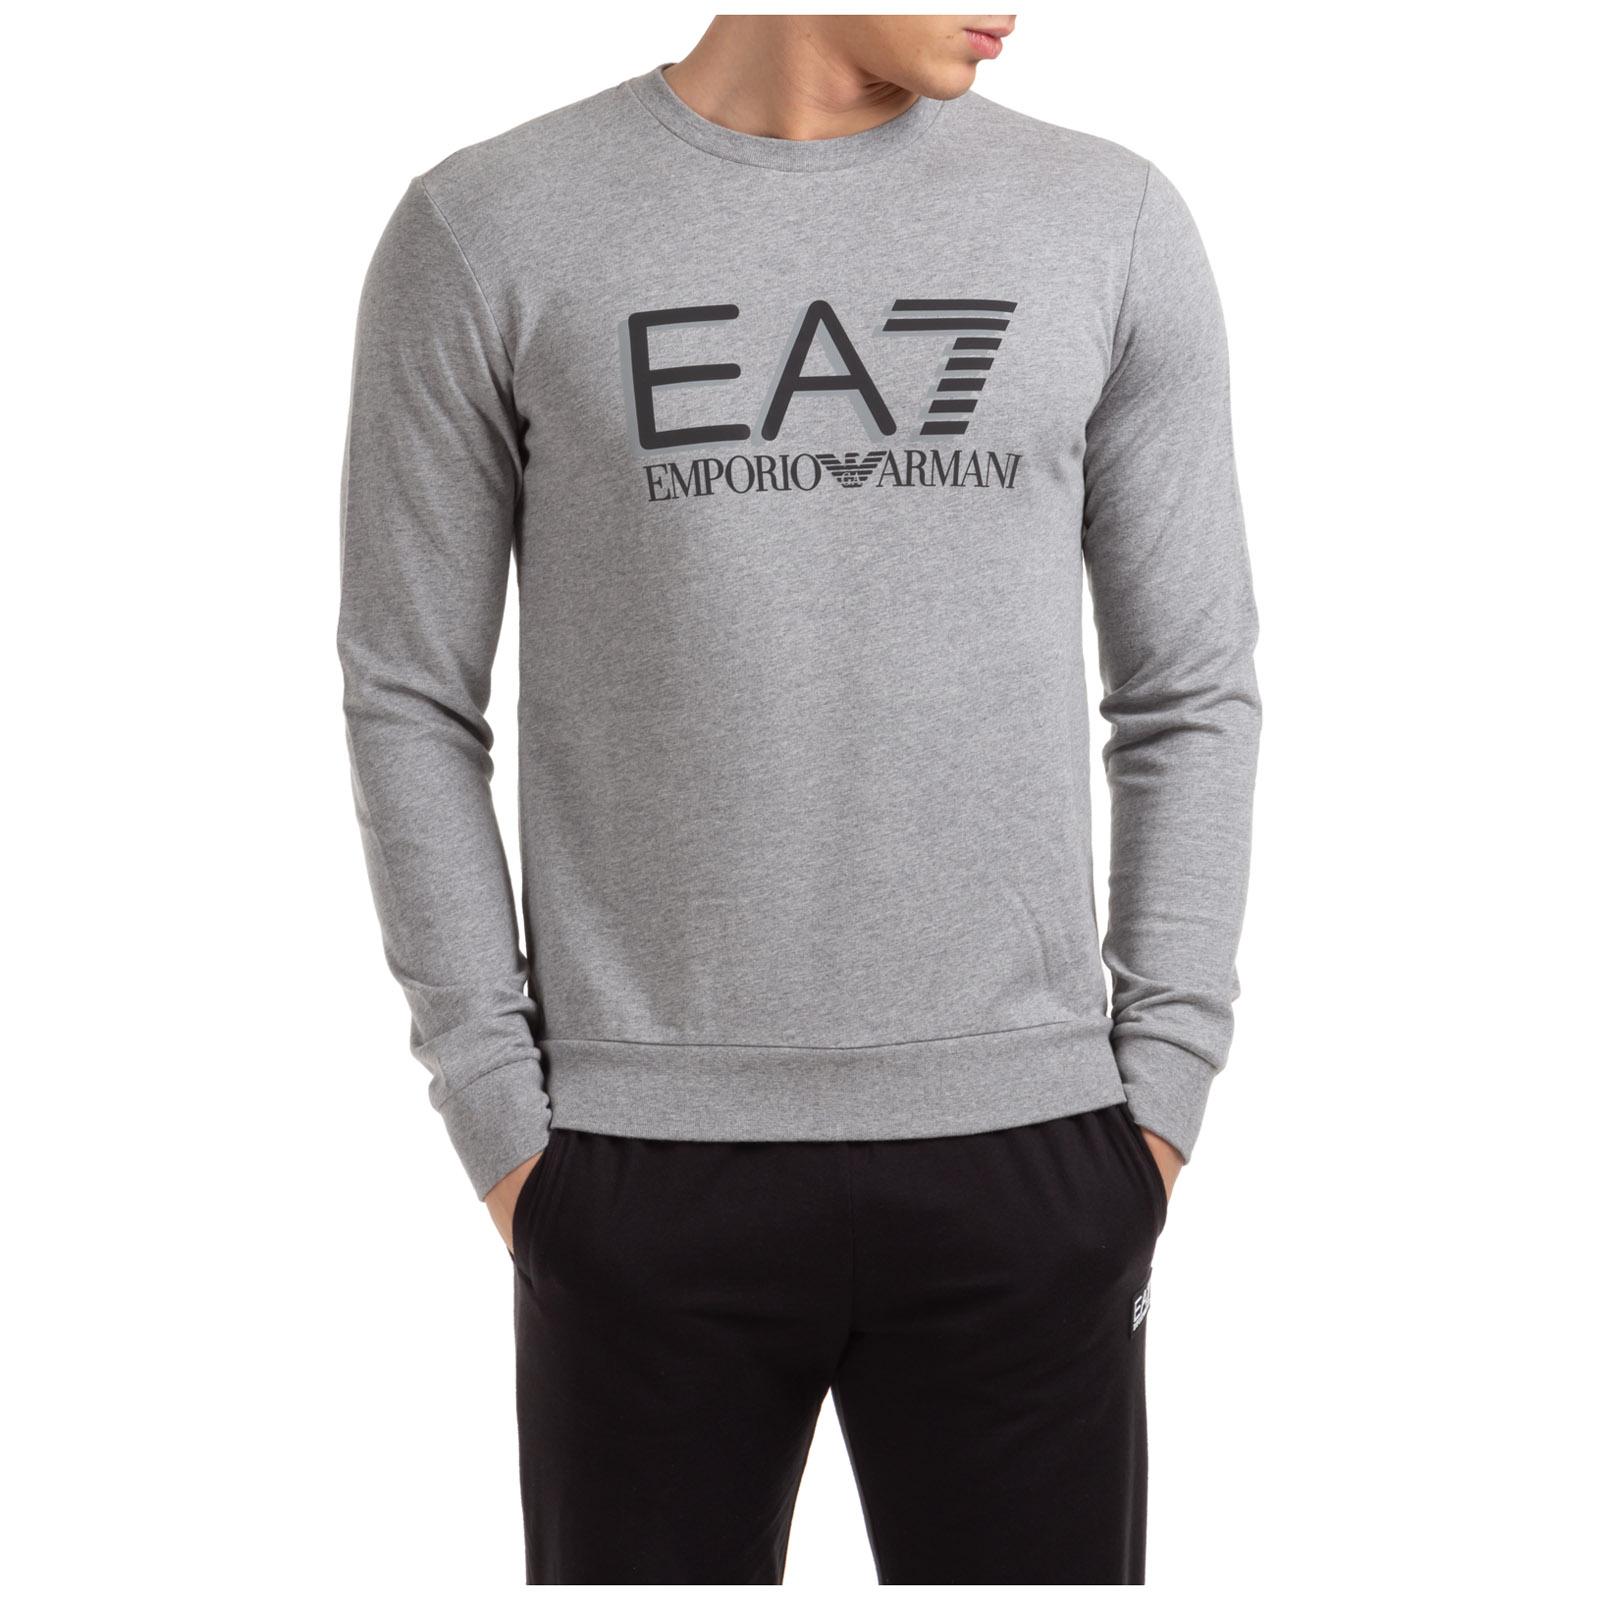 EA7 Sweatsuit Homme